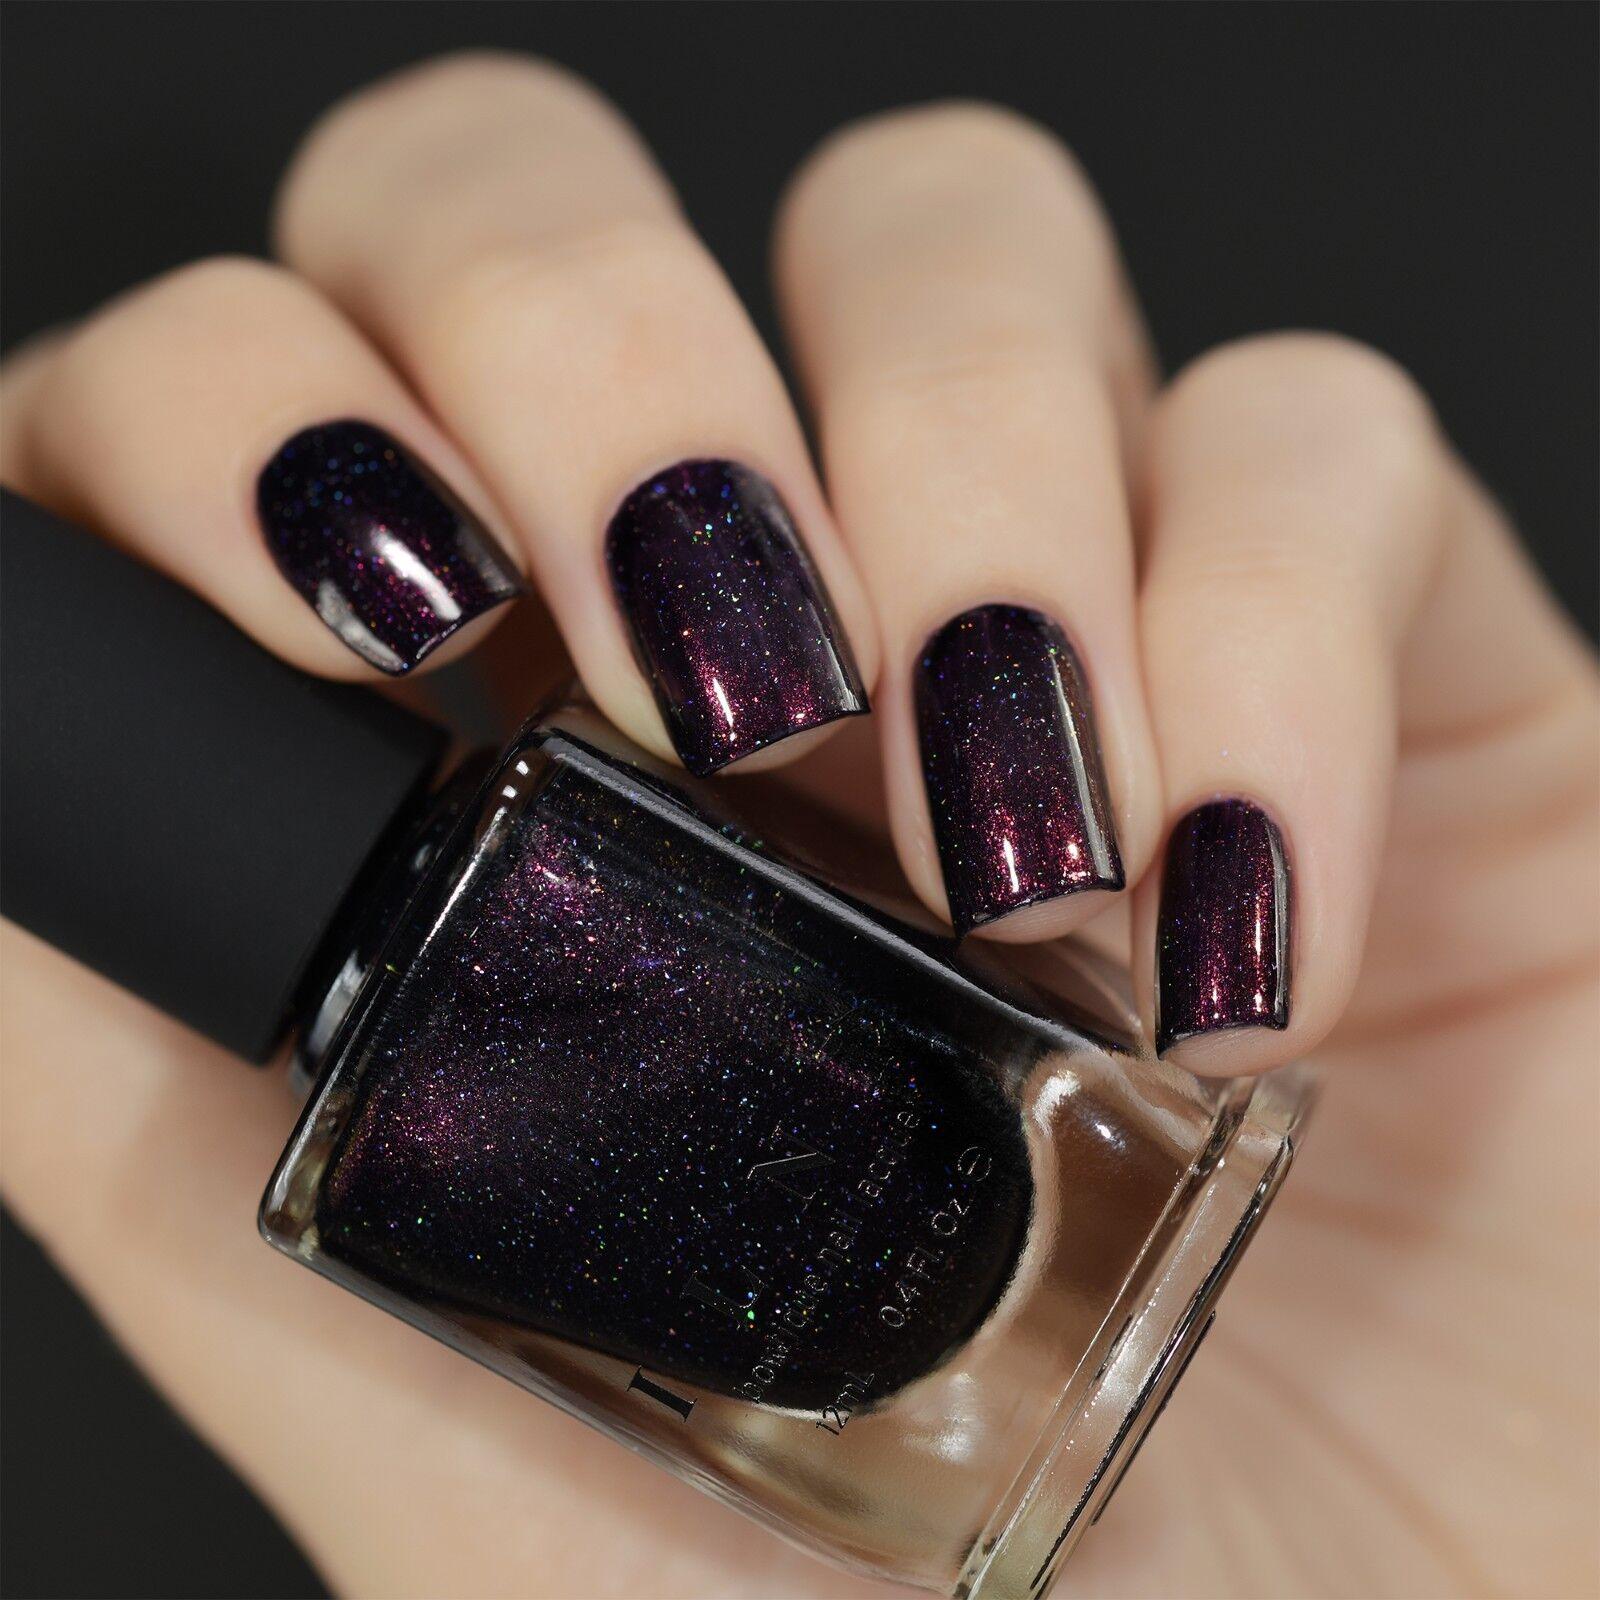 ILNP Mon Amour - Dark Purple Holographic Nail Polish   eBay